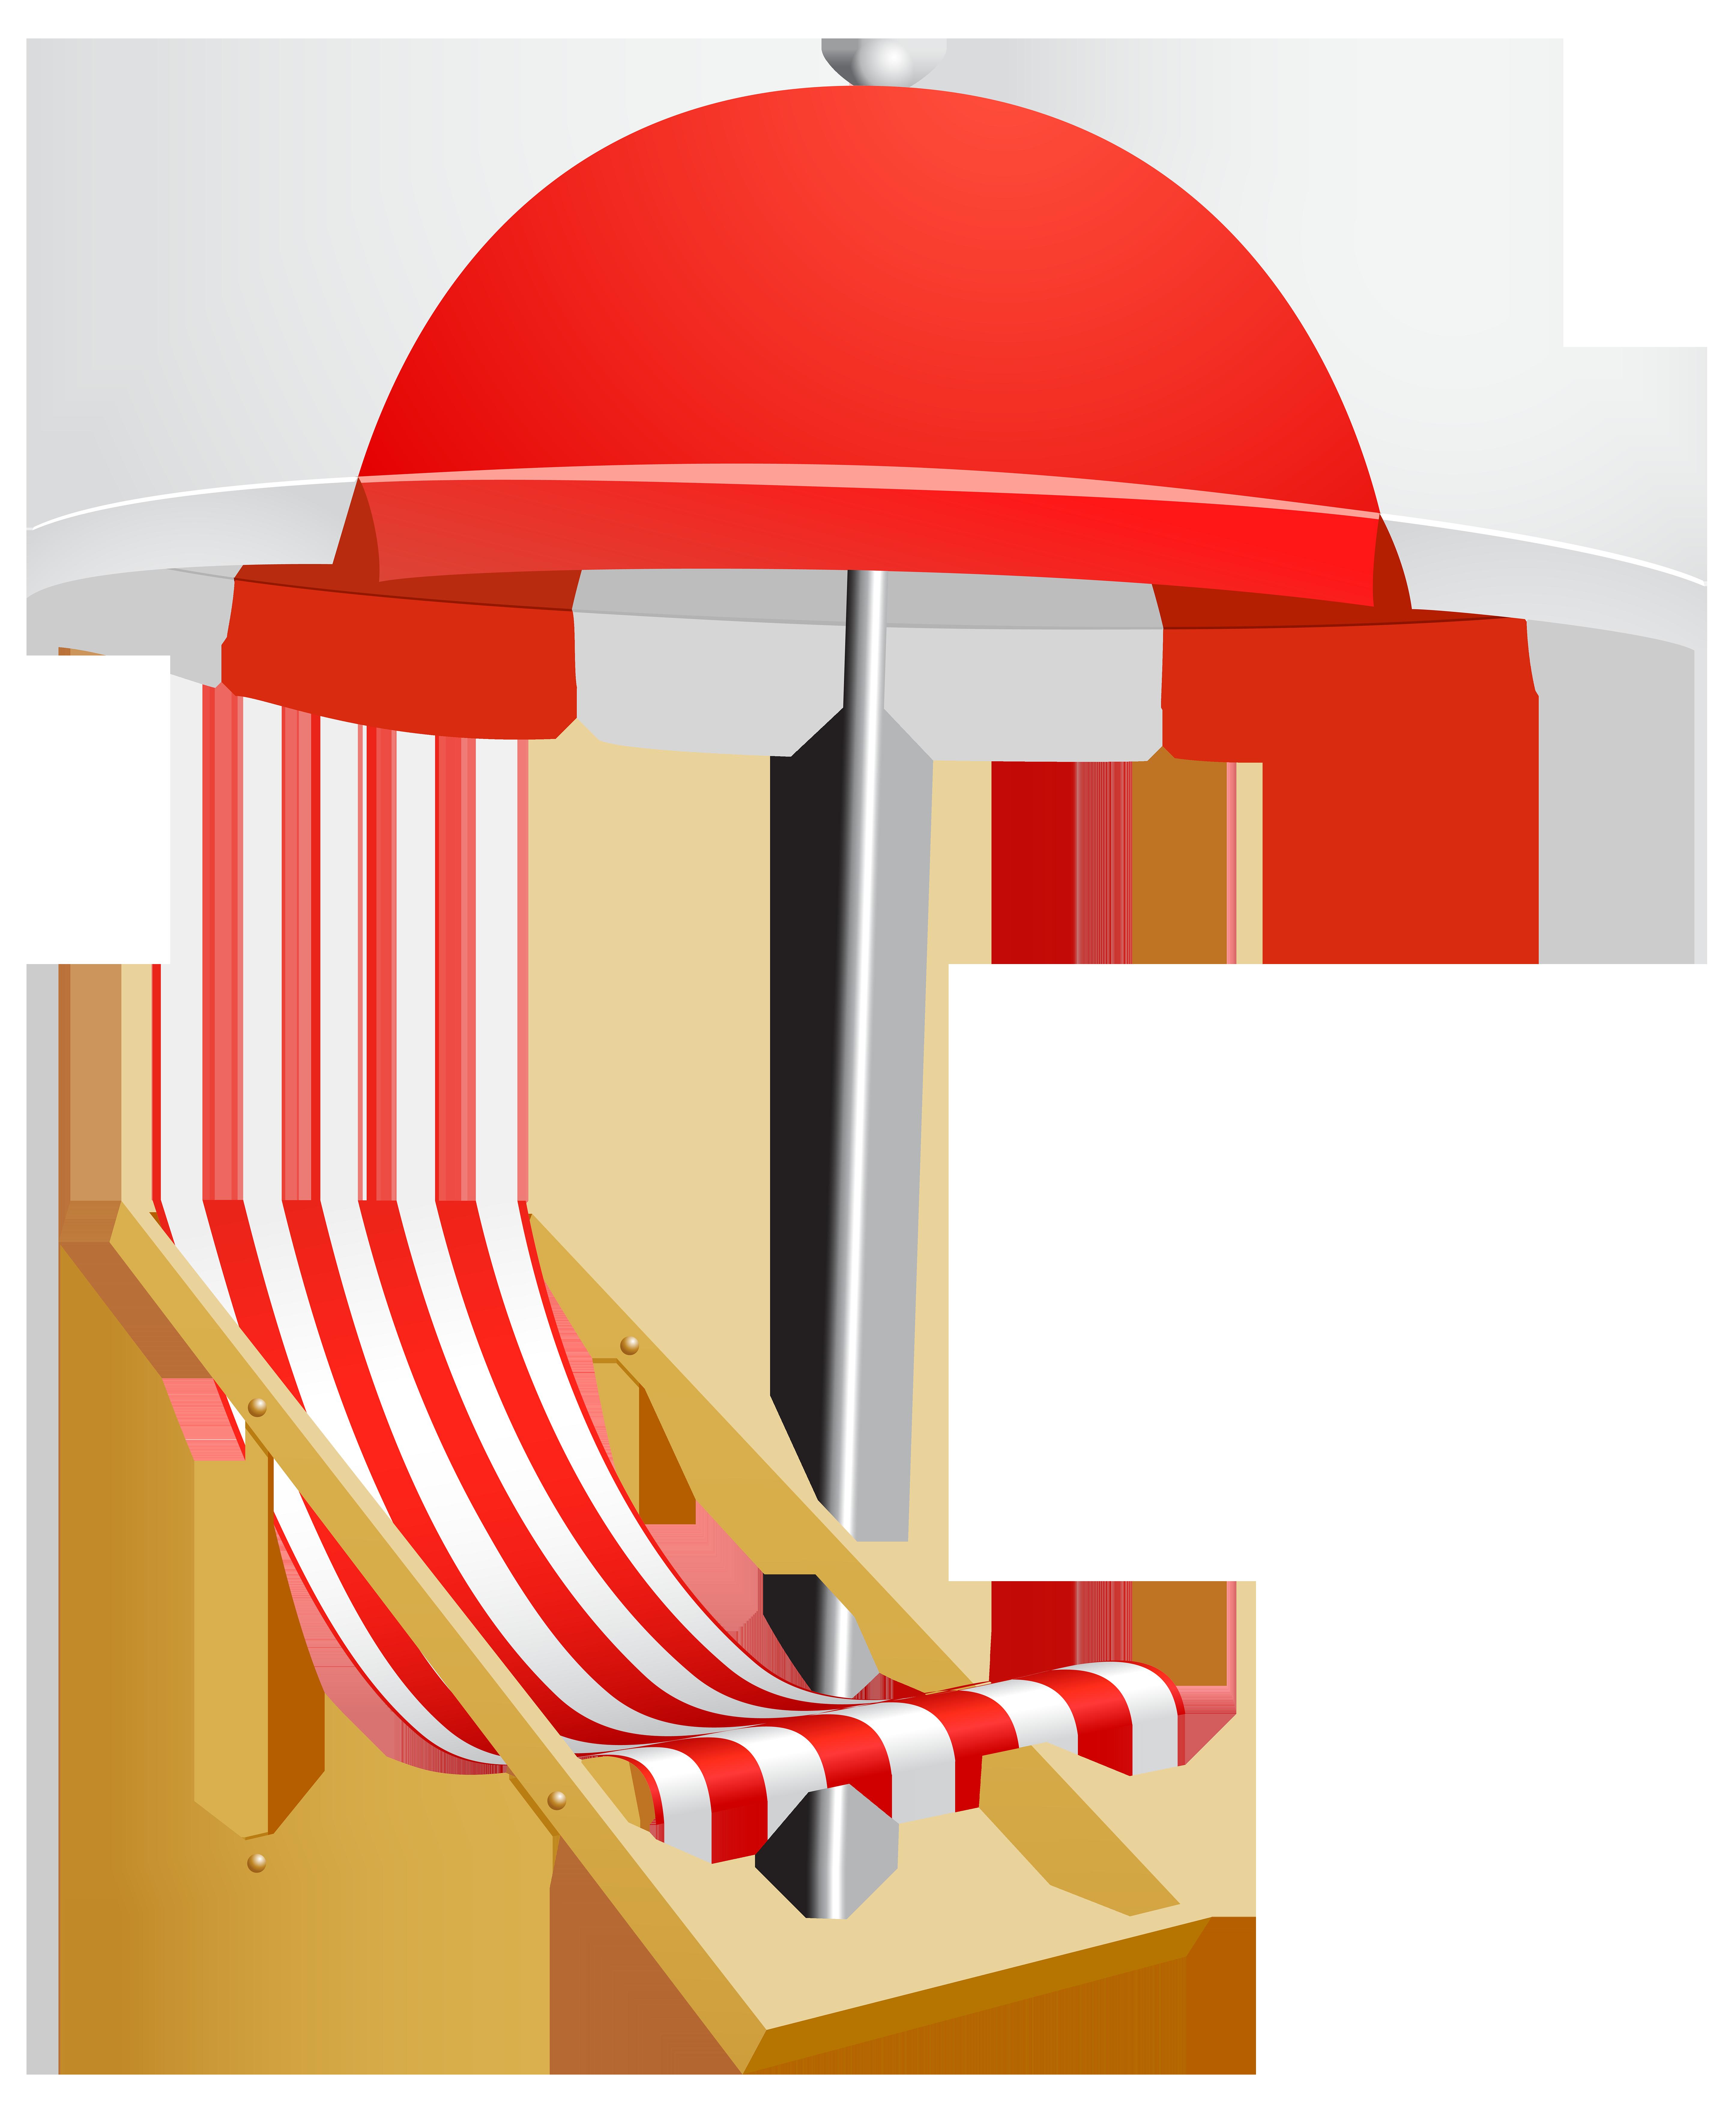 Beach Umbrella and Chair Transparent PNG Clip Art Image